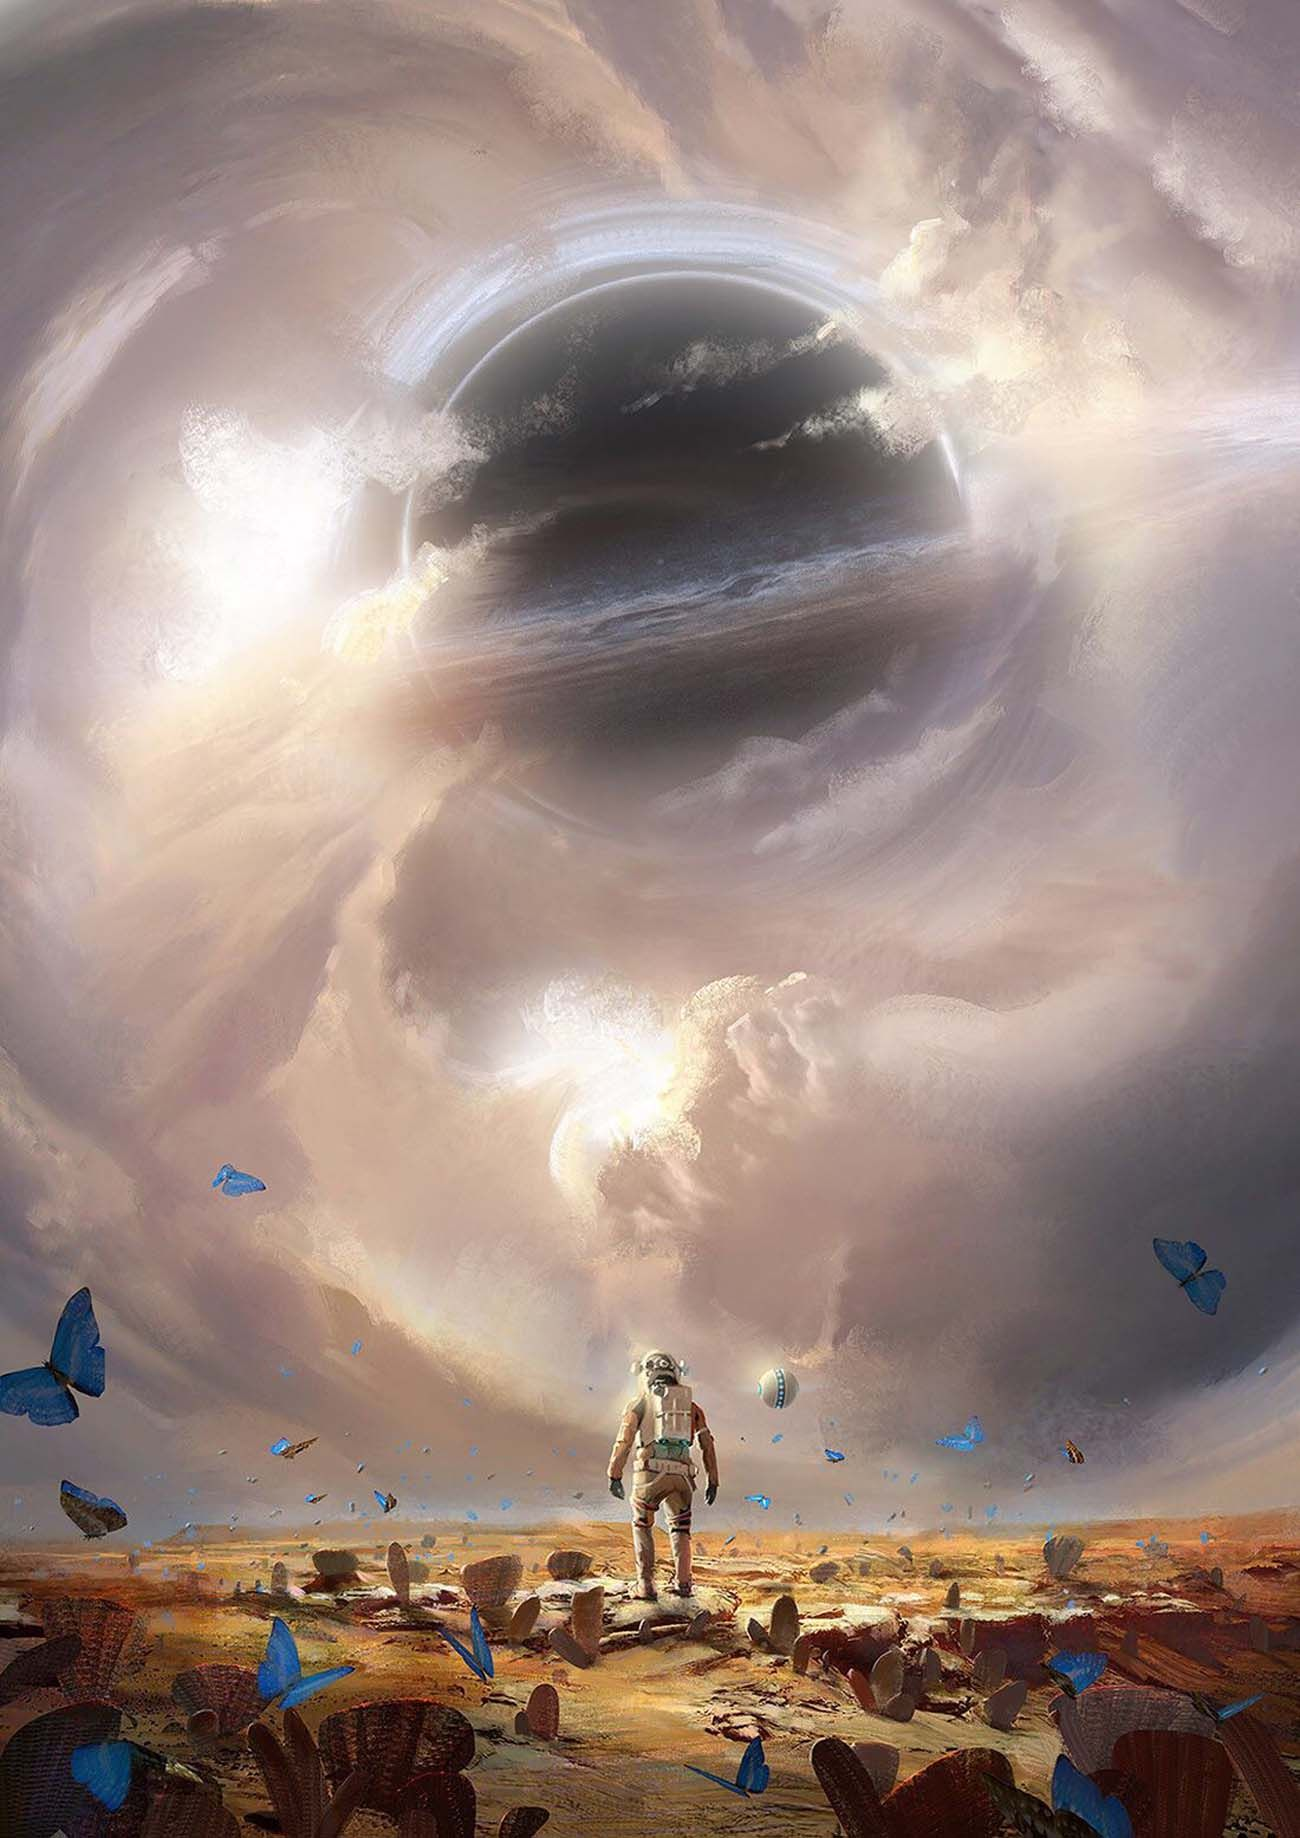 Digital Painting Inspiration Vol 27 Sci Fi Concept Art Fantasy Landscape Digital Painting